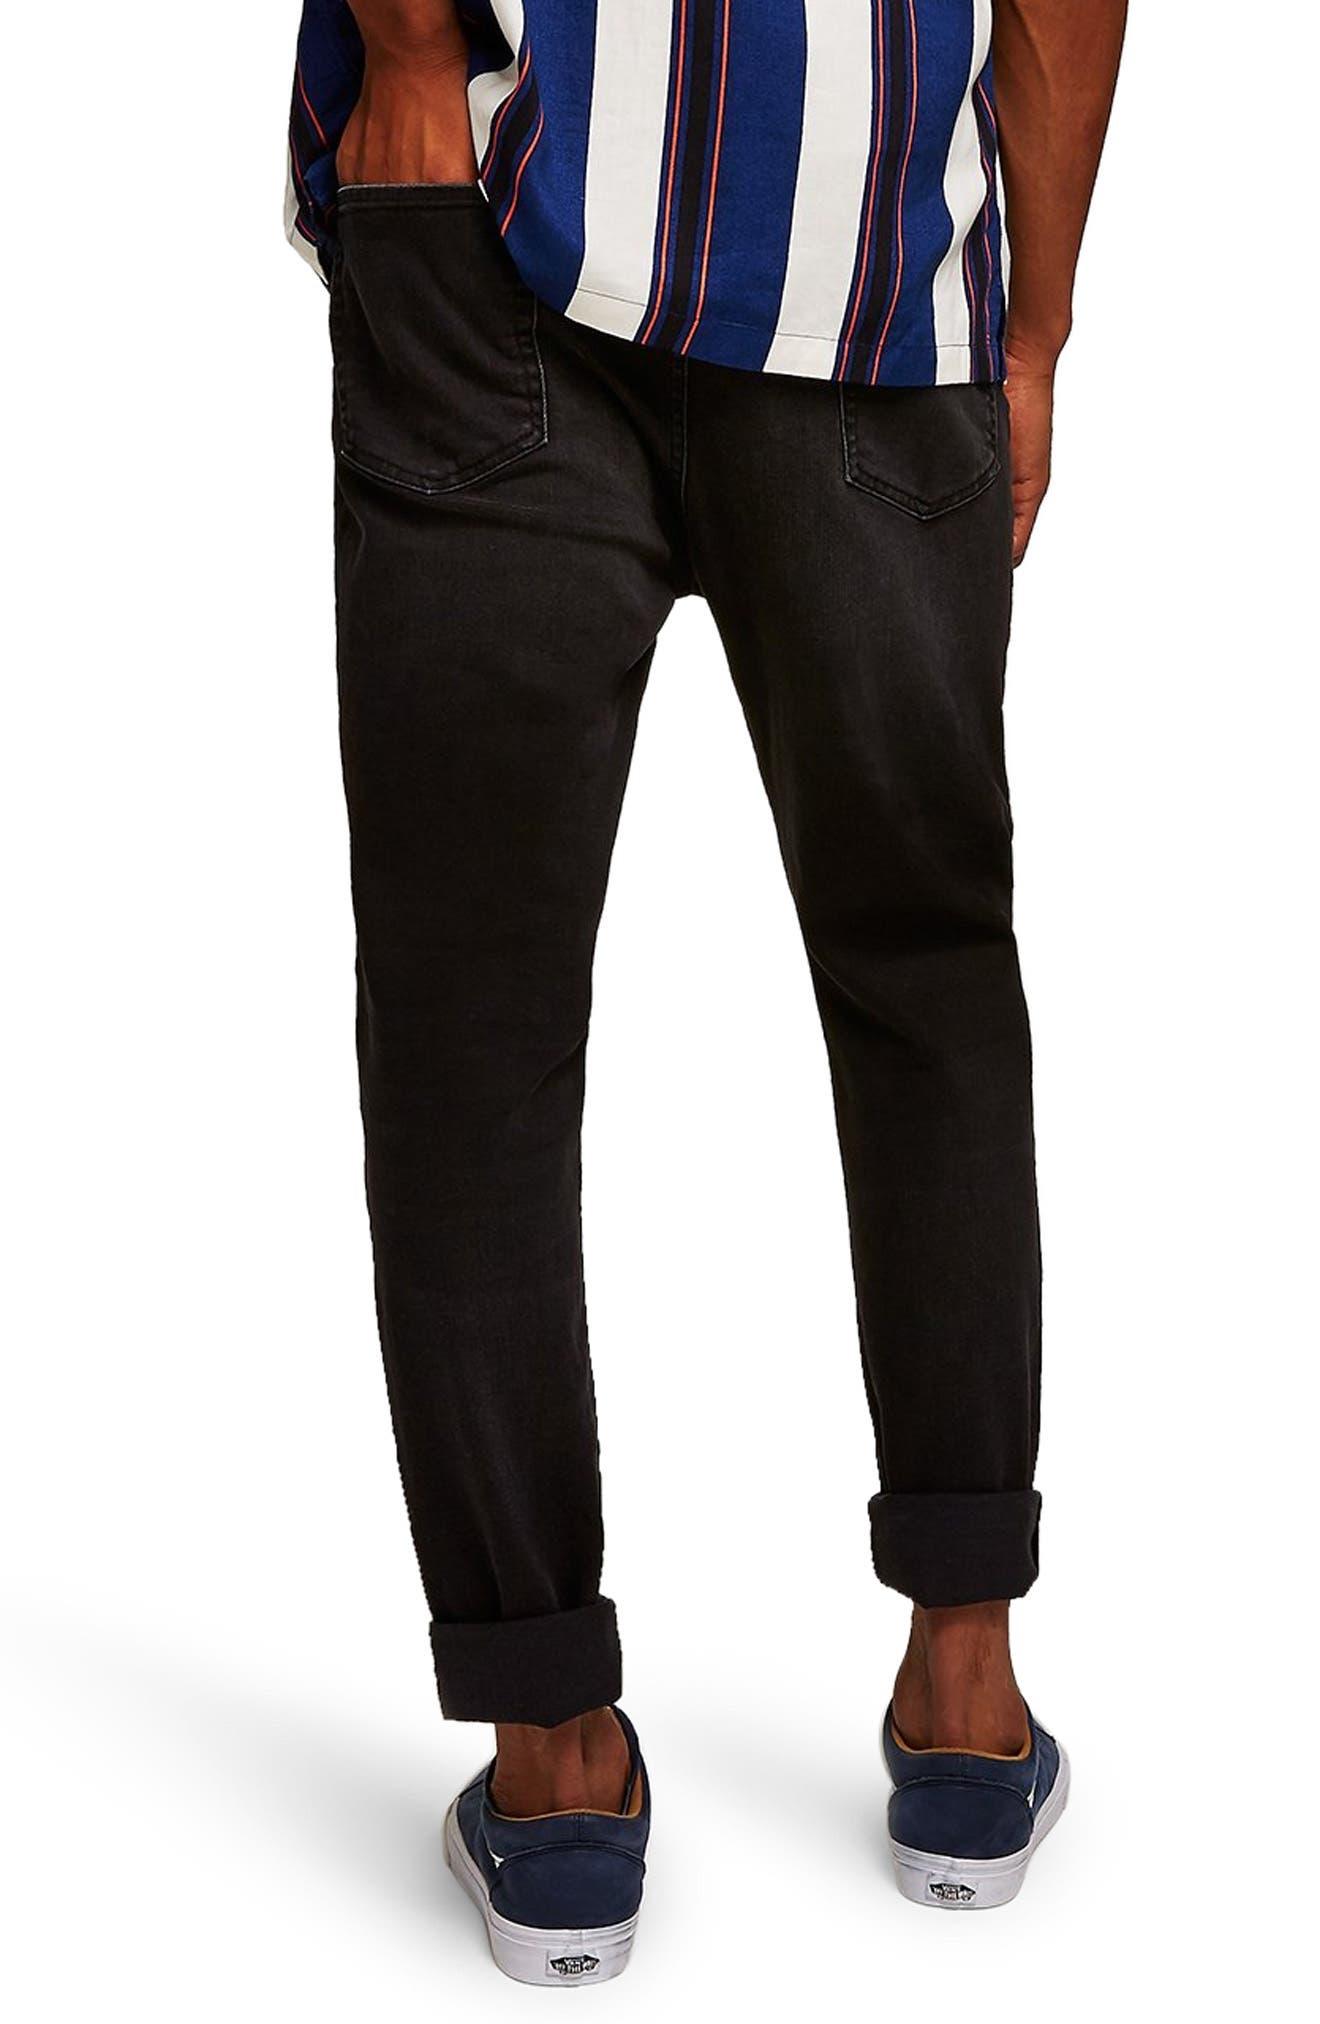 Topshop Jogger Skinny Jeans,                             Alternate thumbnail 2, color,                             BLACK